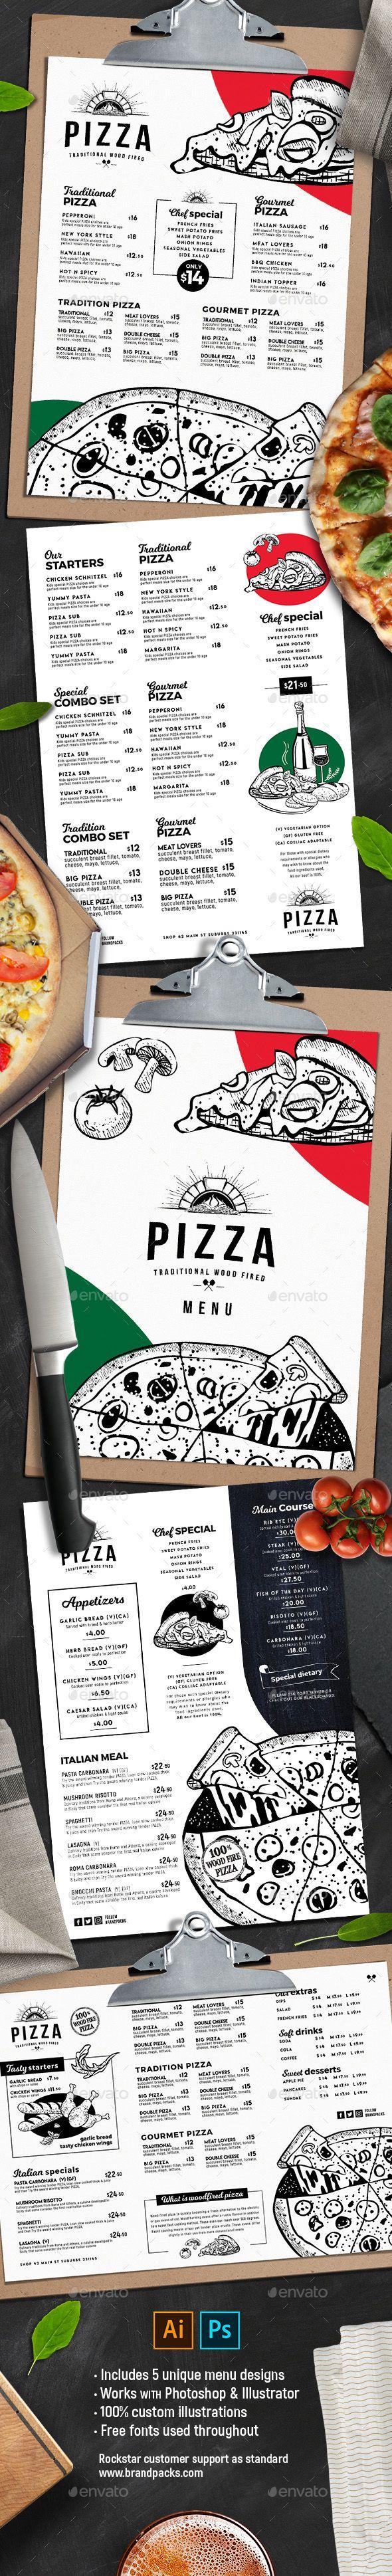 #Pizza #Menu Templates - #Food Menus Print Templates